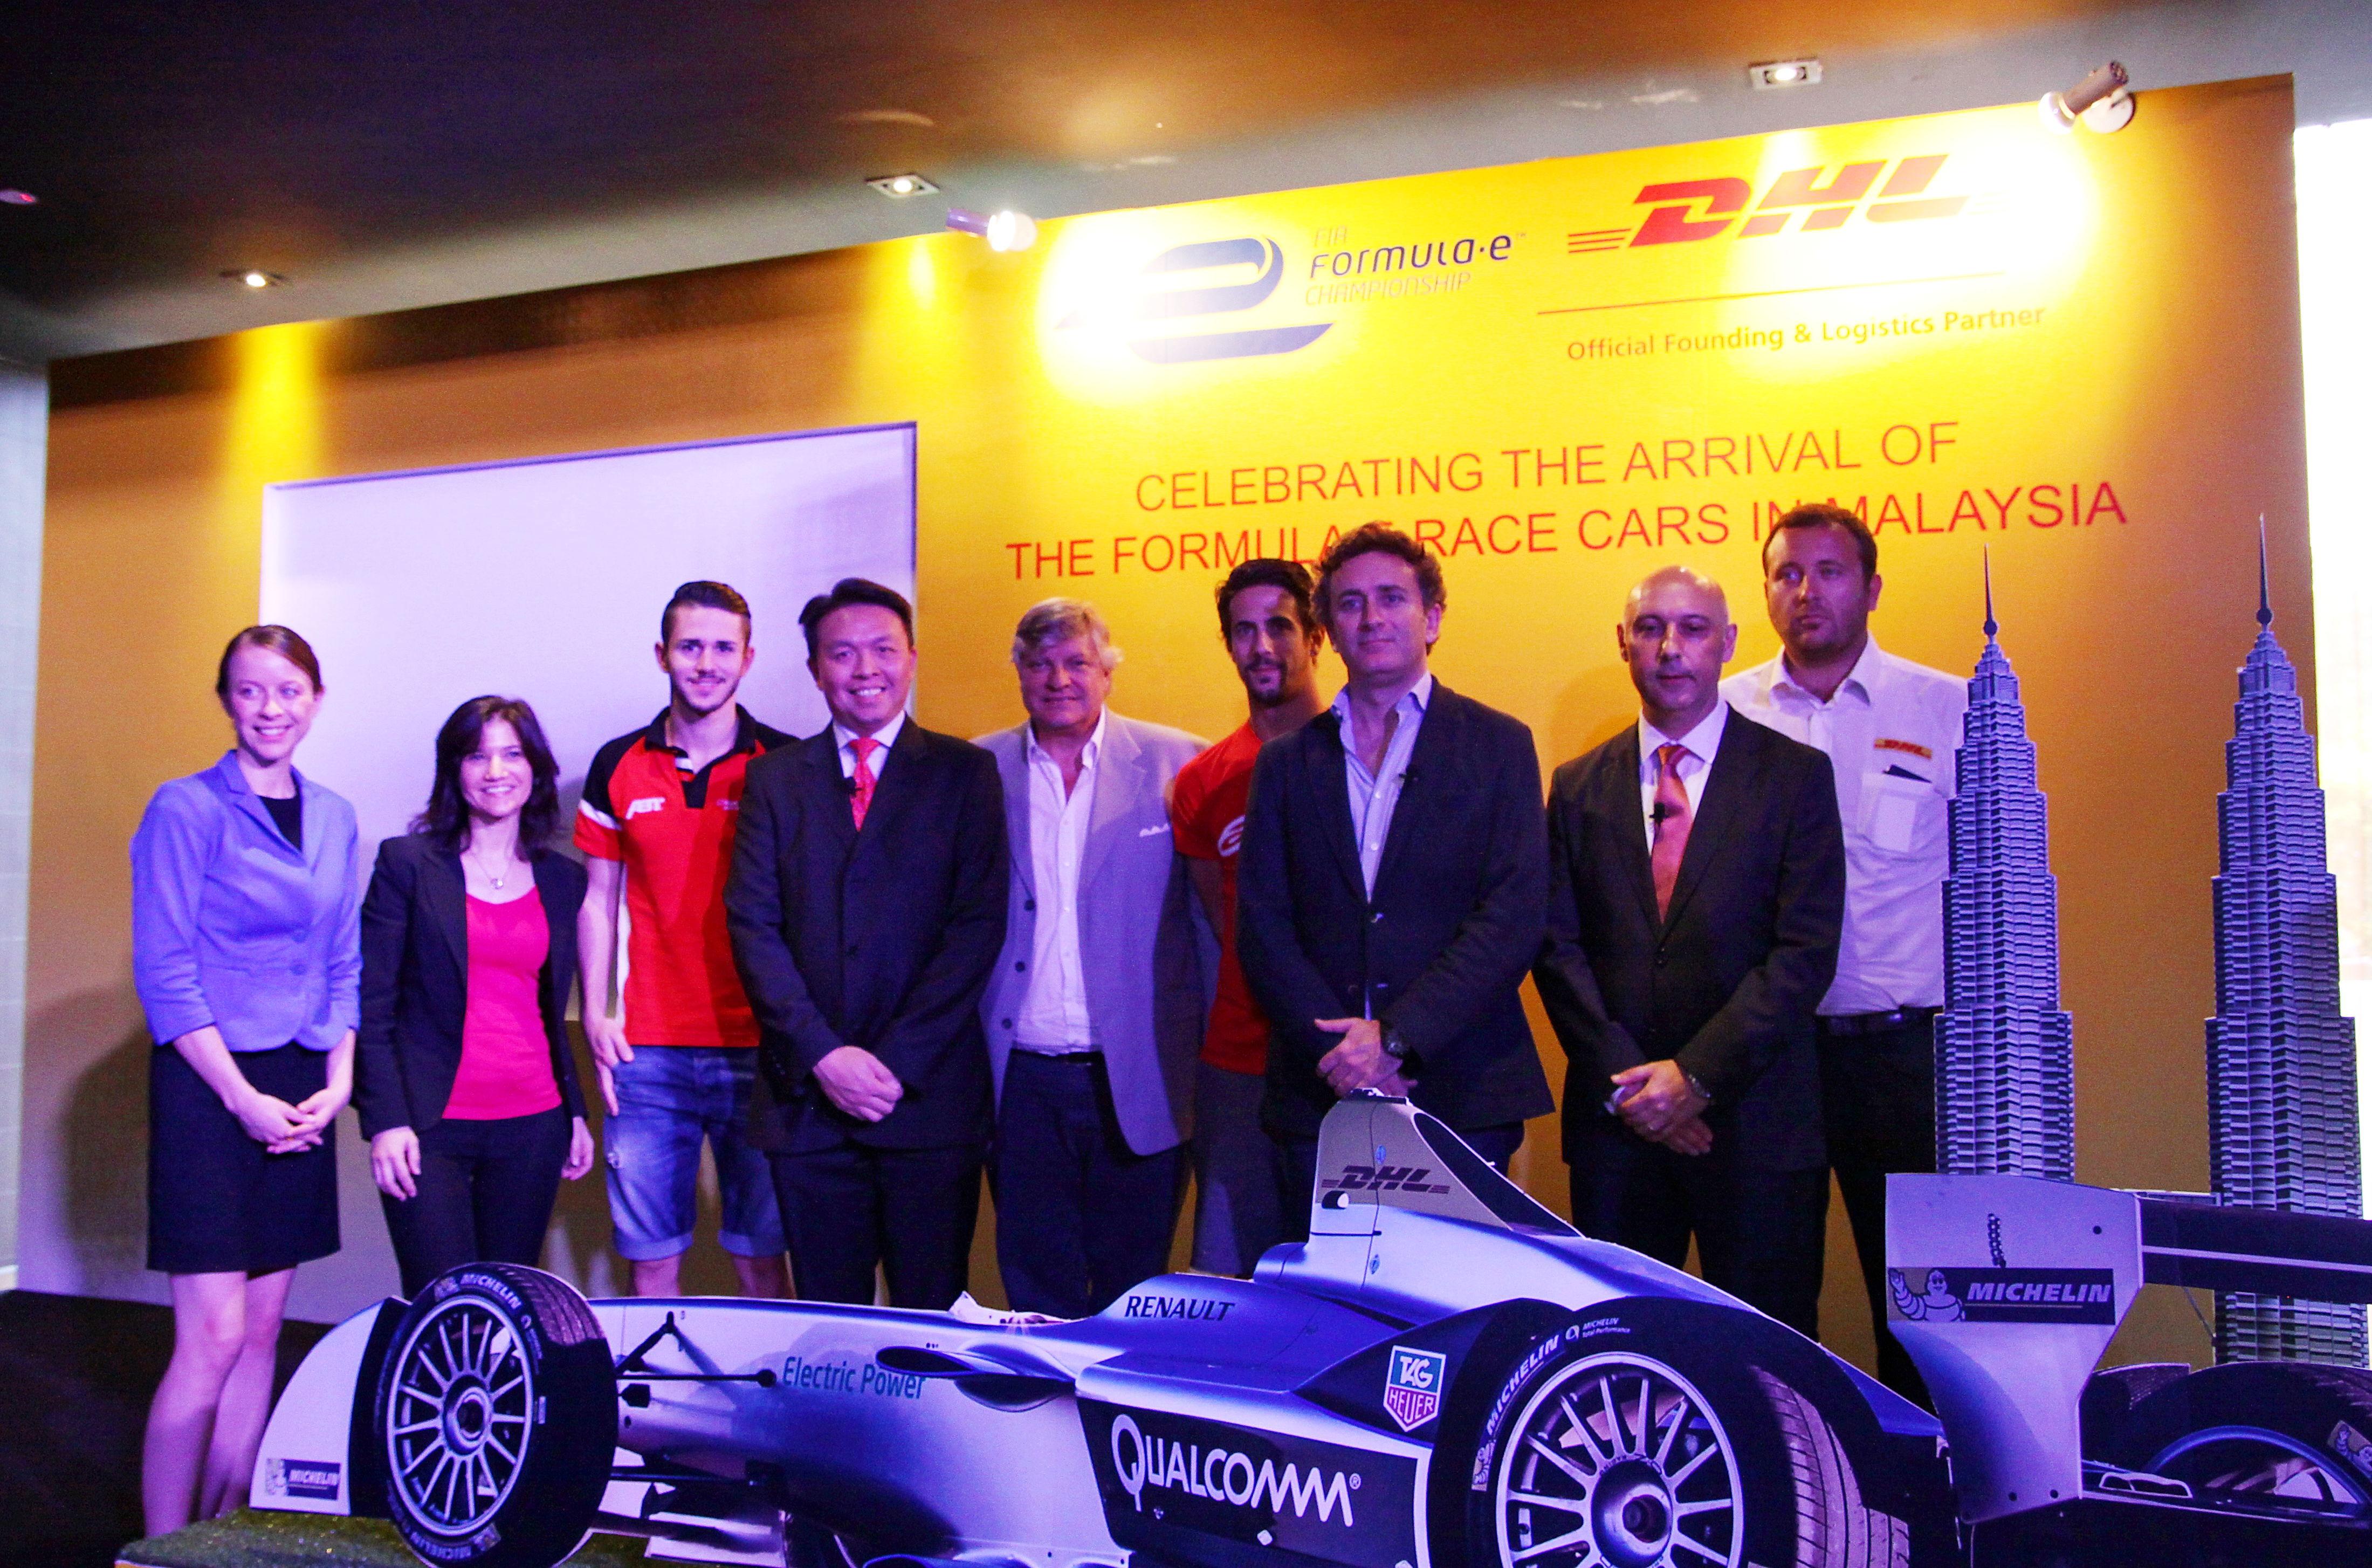 Formula E & DHL collaboration